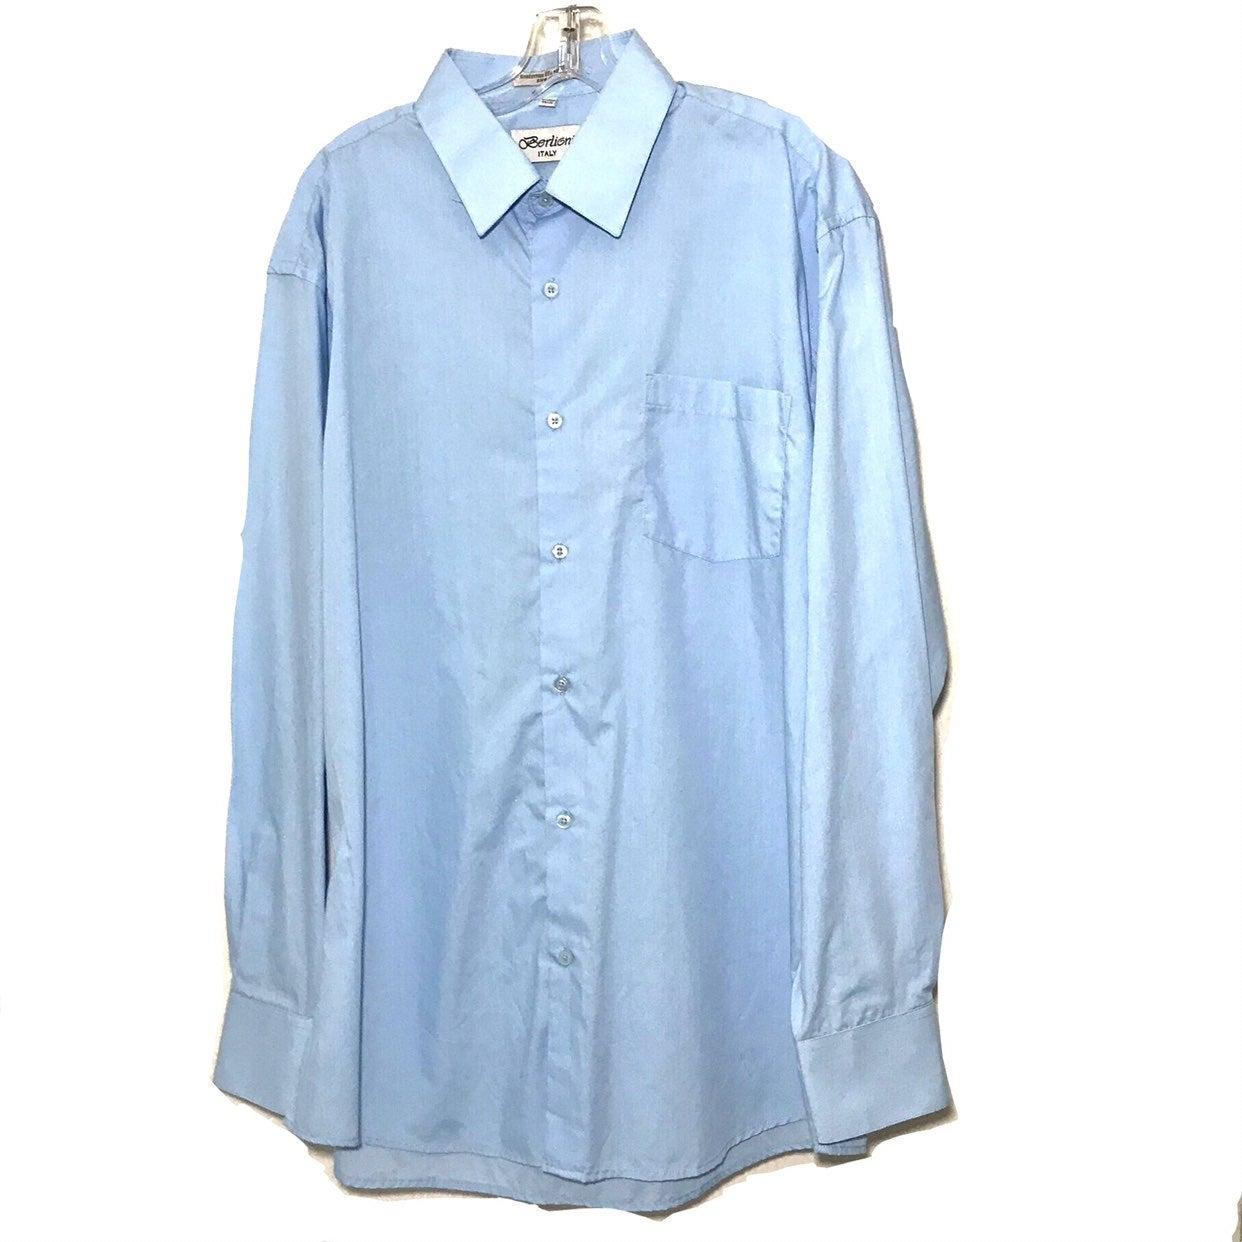 Berlioni Italy Men's Dress Shirt